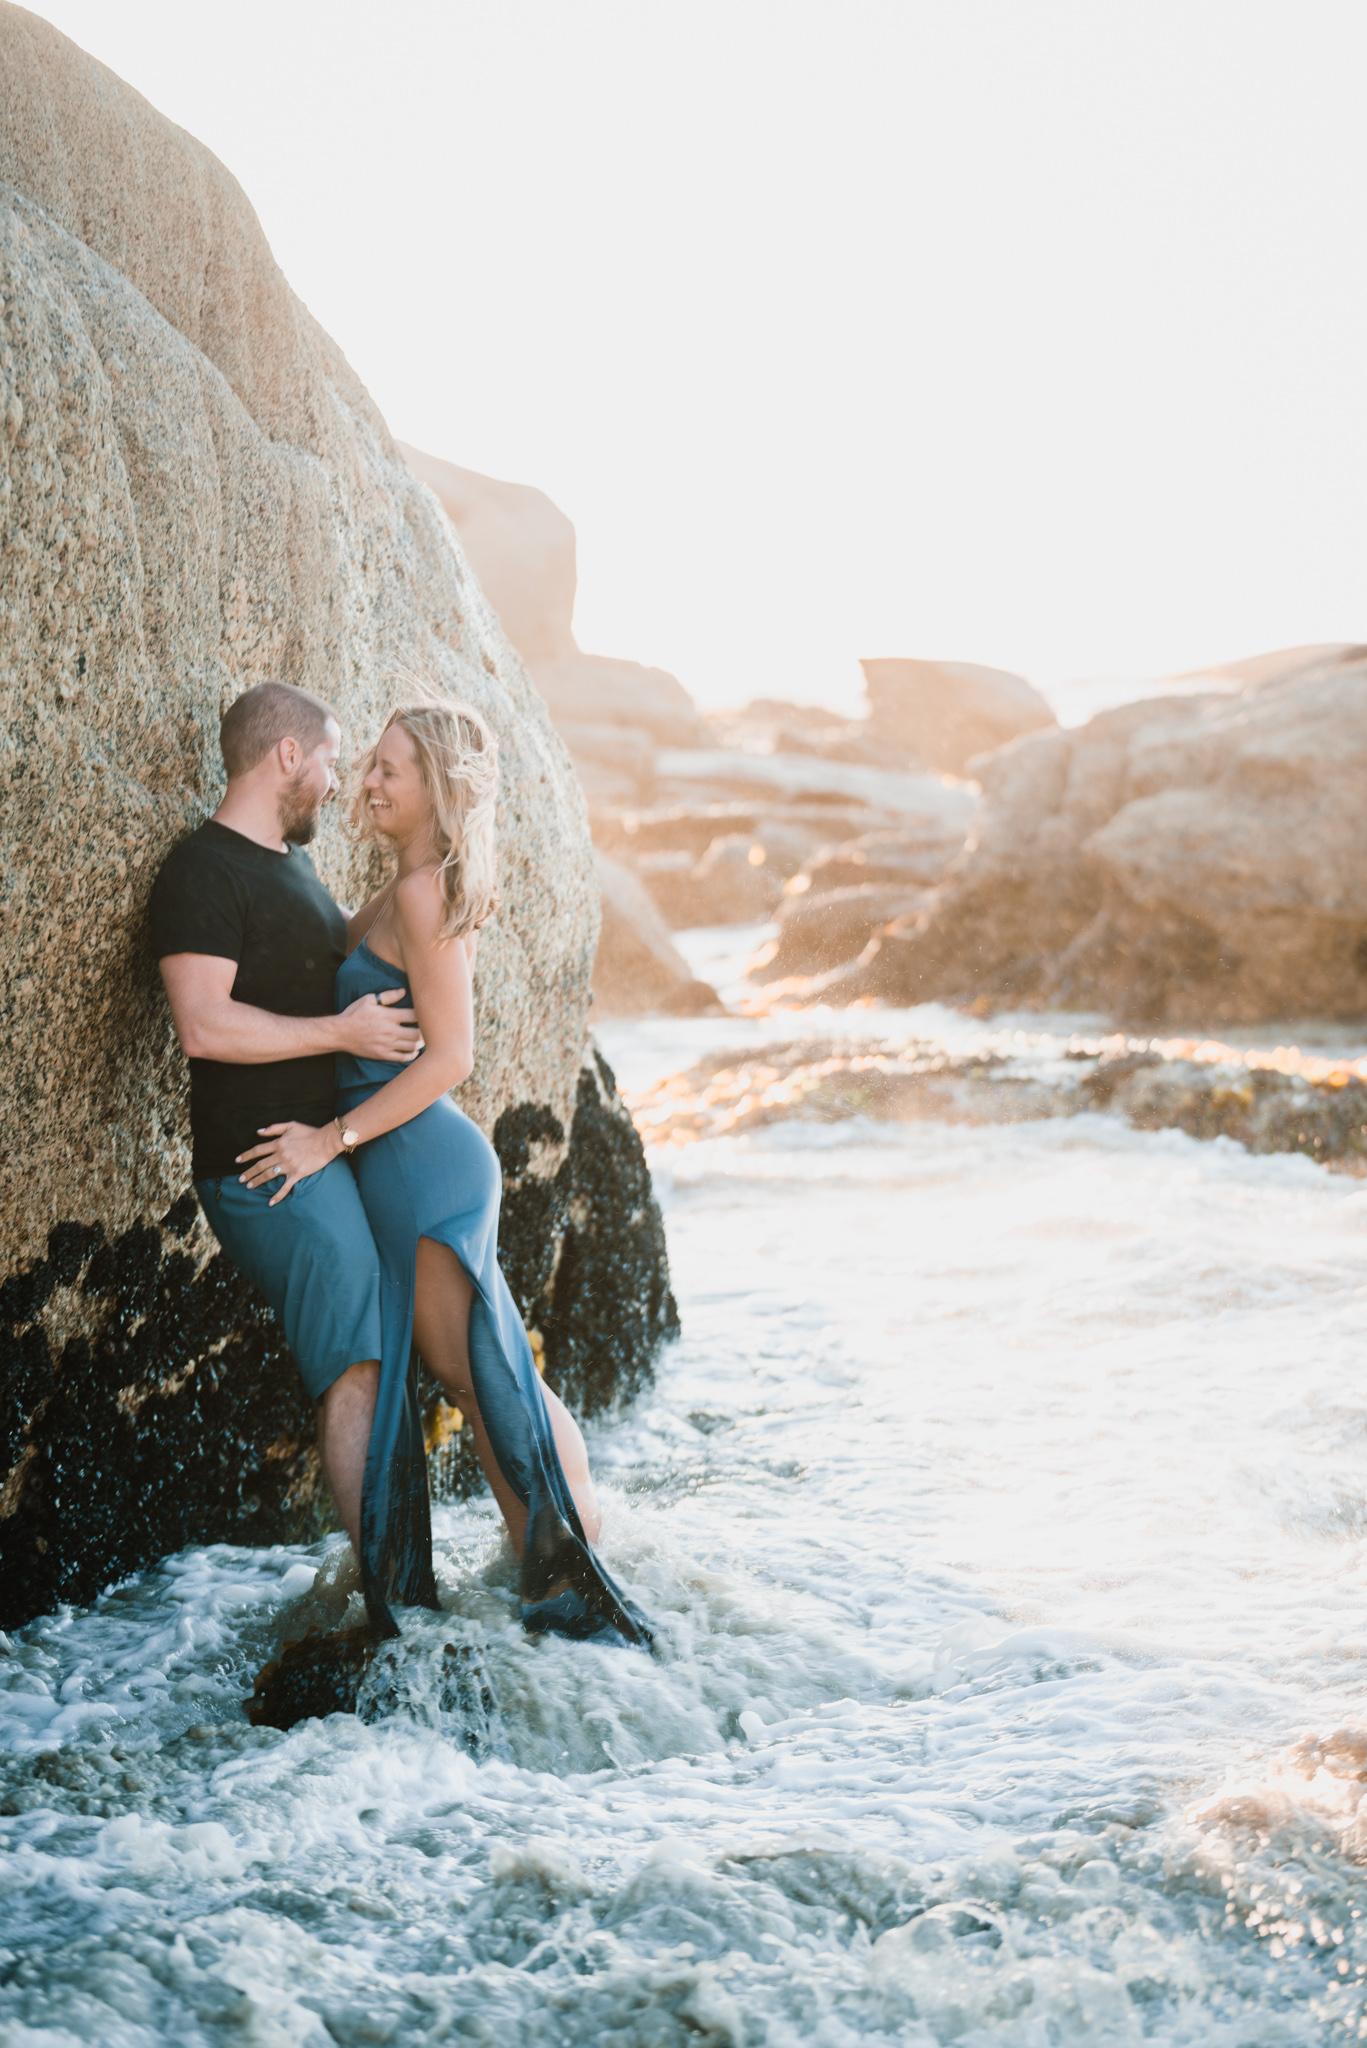 Ross & Candice engagement (129 of 166).JPG